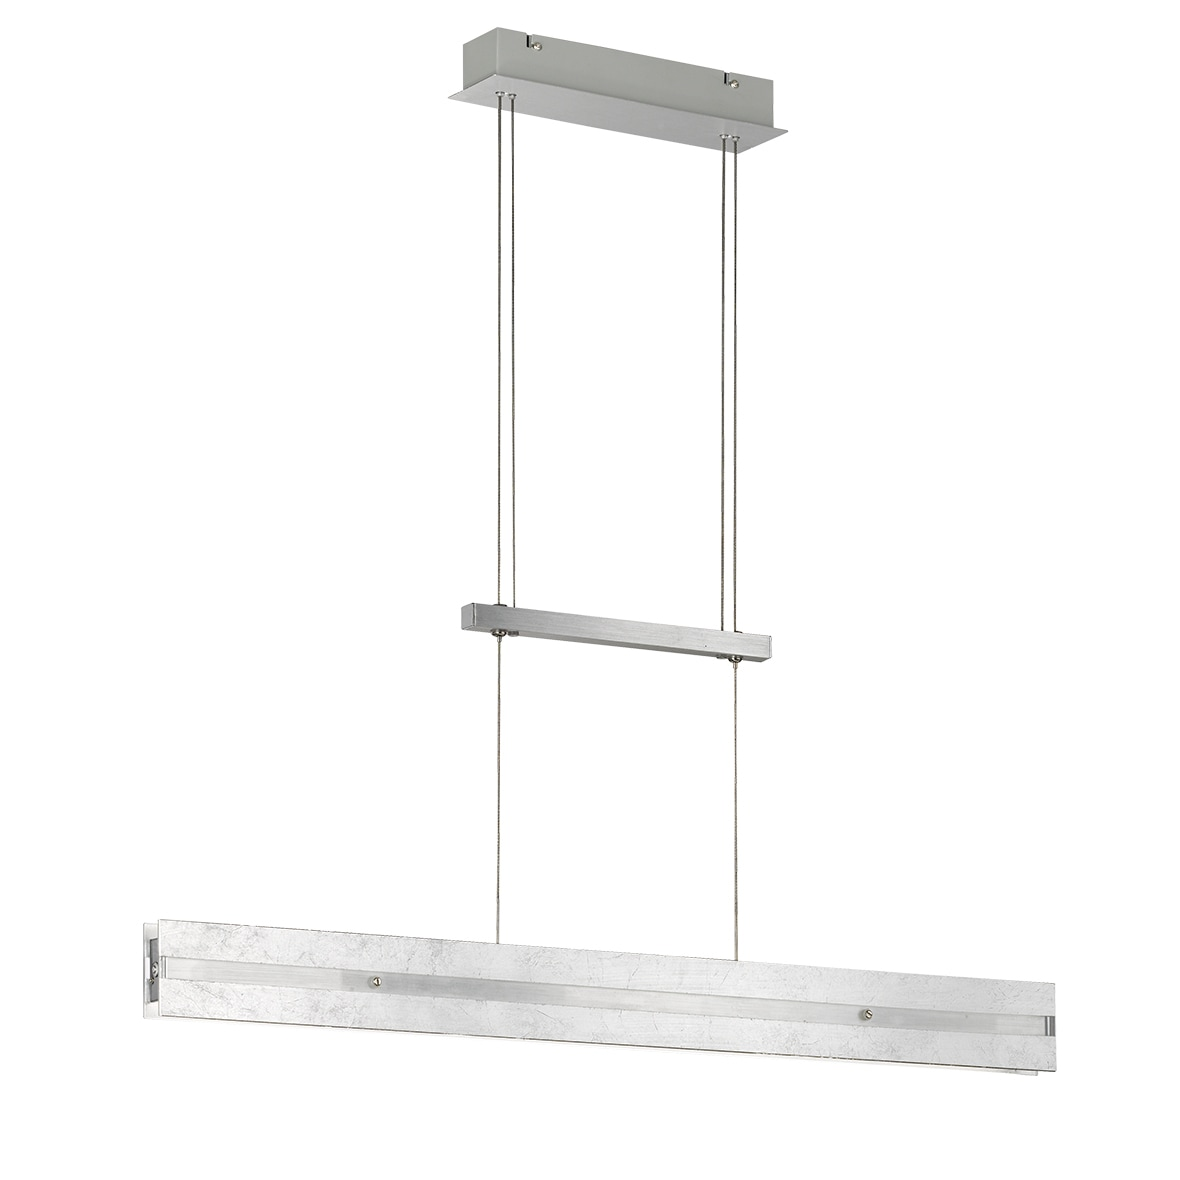 WOFI LED Pendelleuchte Arlon, LED-Board, Warmweiß